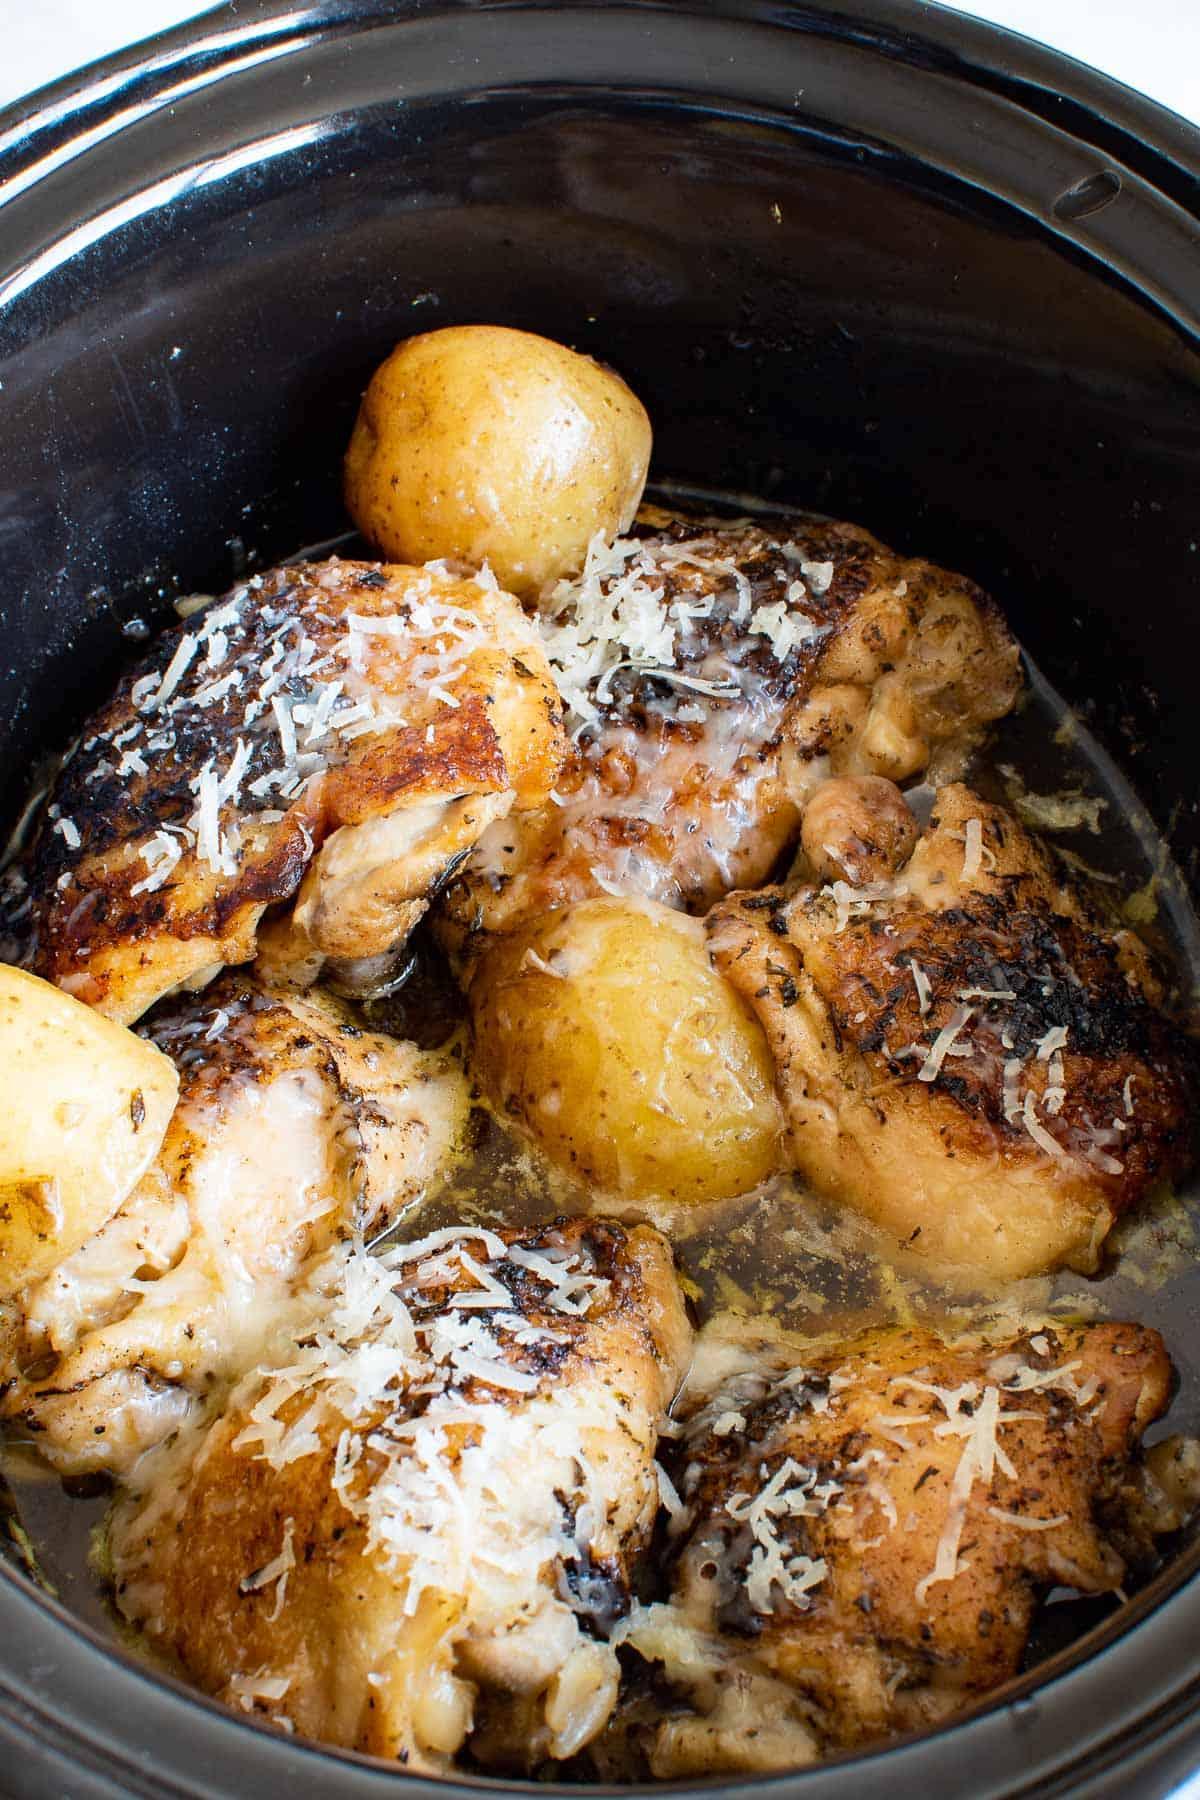 Crockpot garlic Parmesan chicken and potatoes.